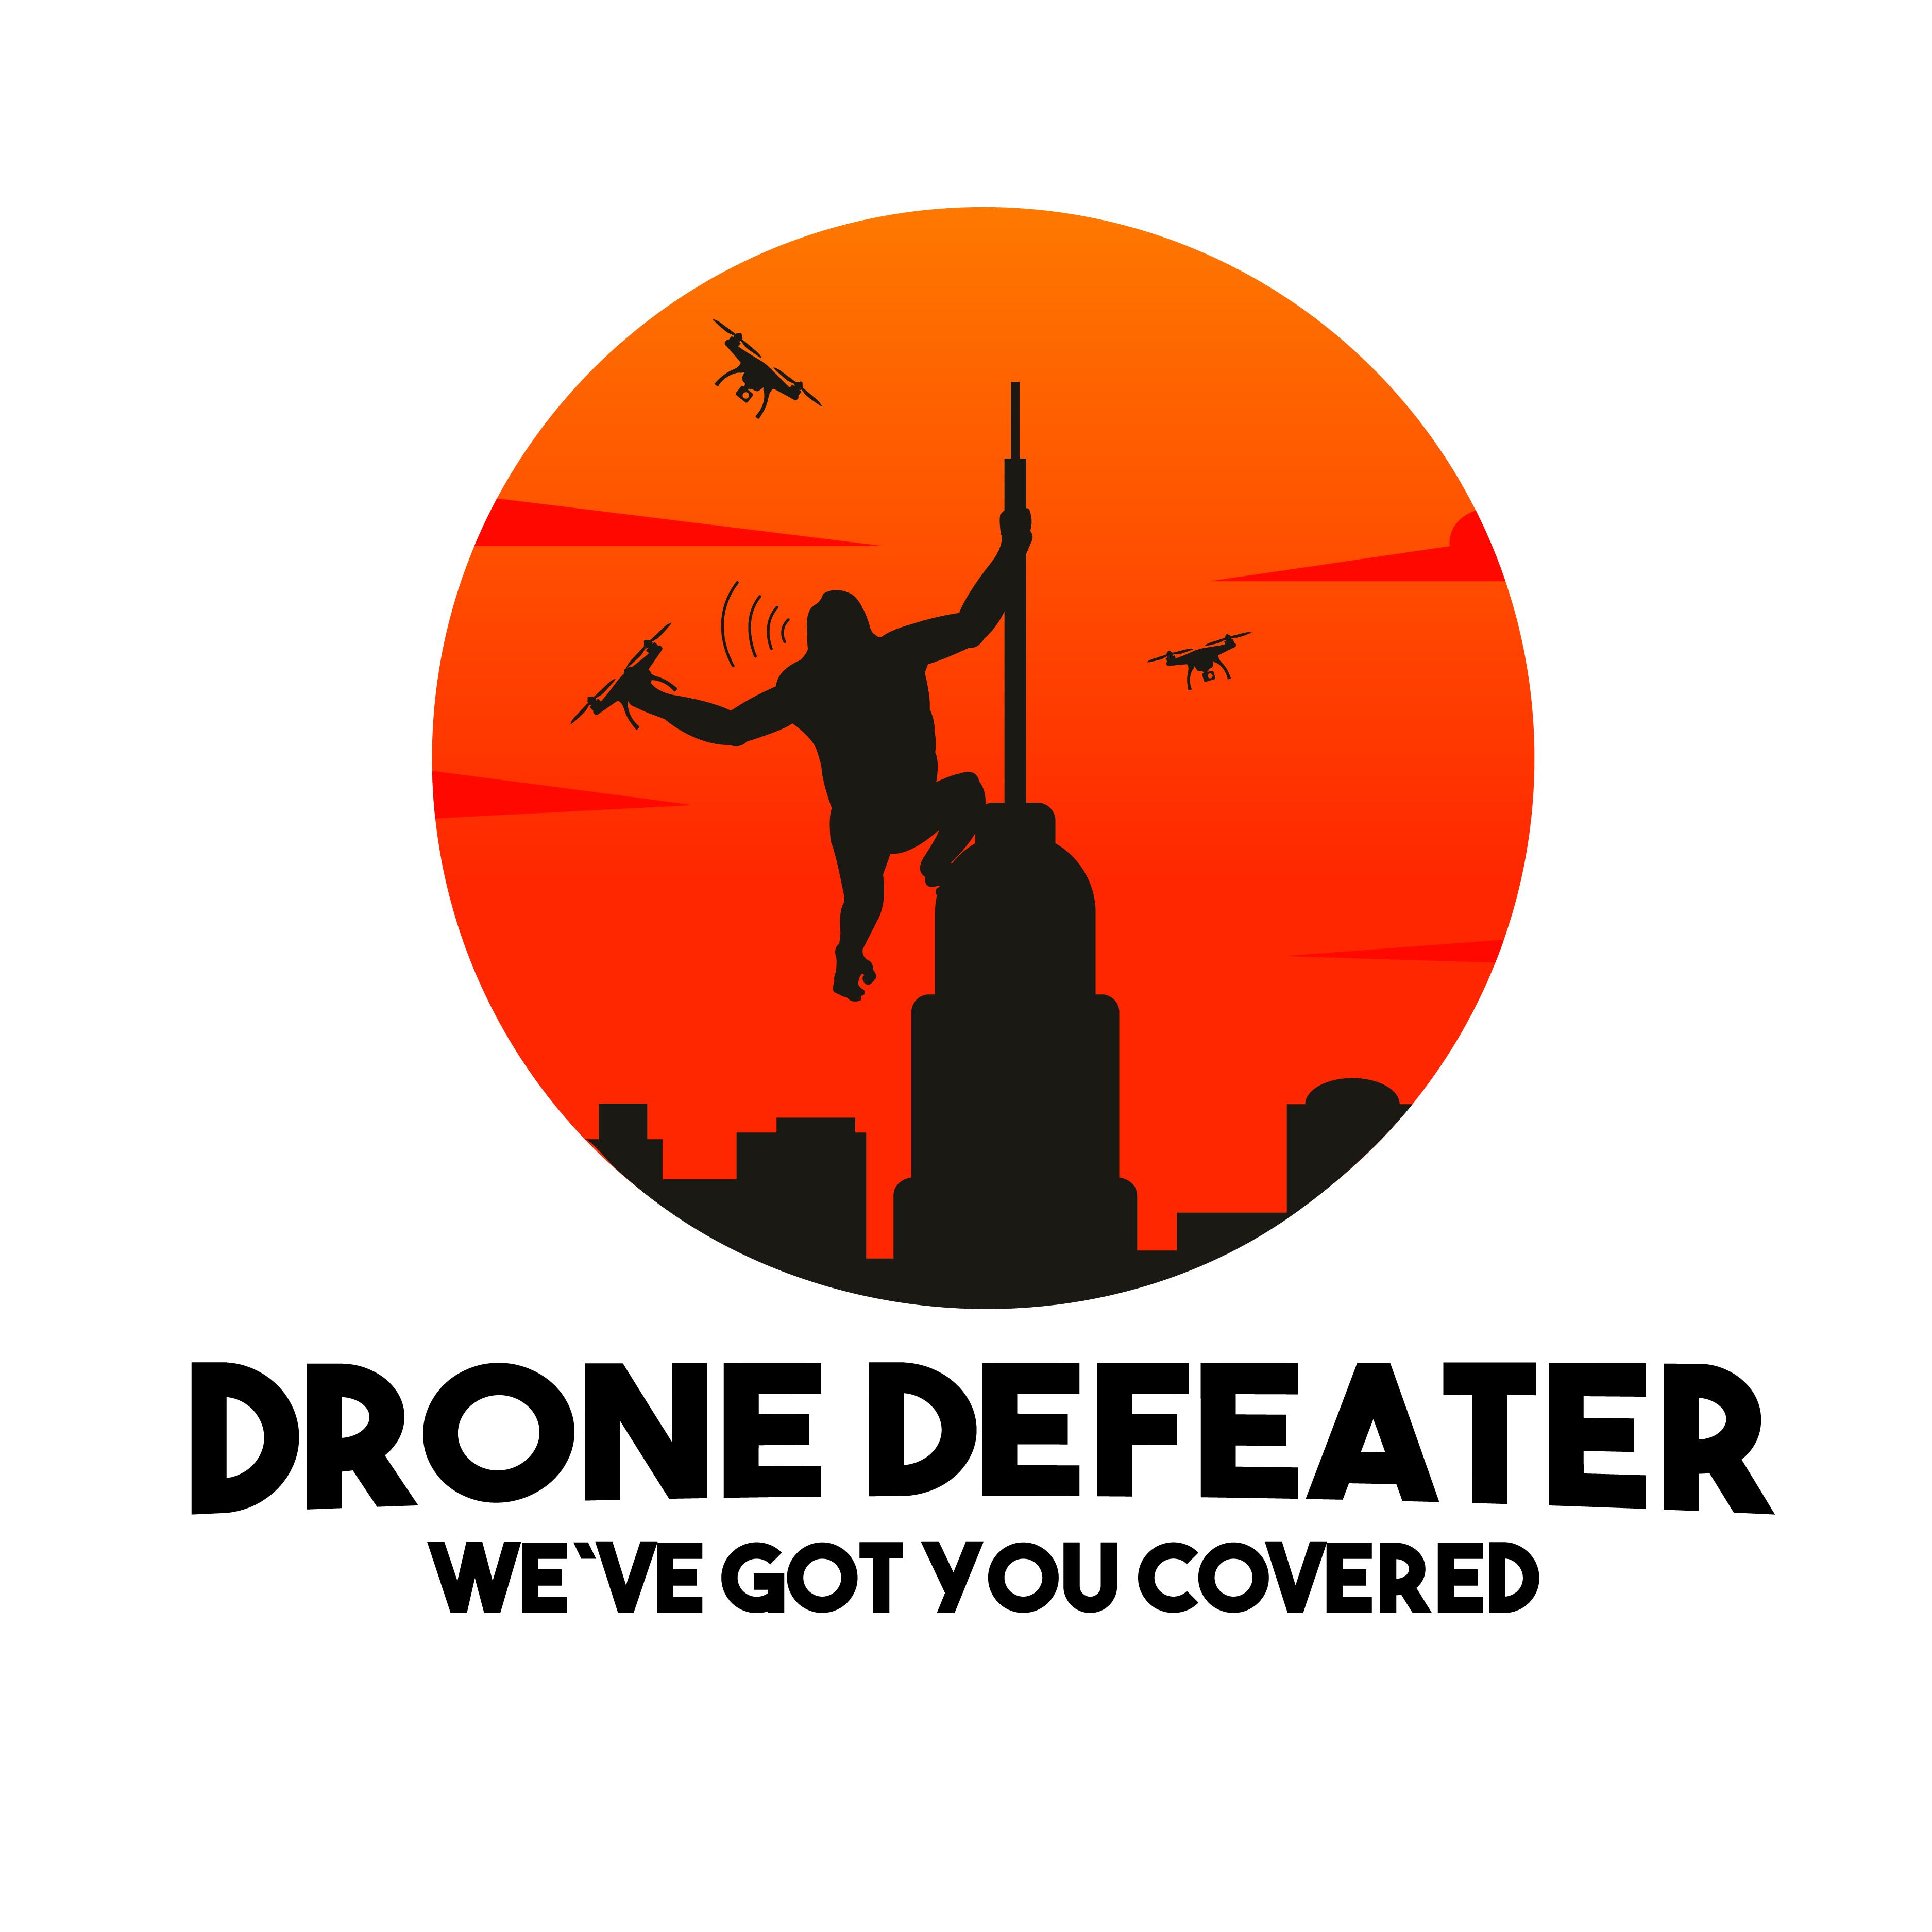 Logo Design by pojas12 - Entry No. 67 in the Logo Design Contest Artistic Logo Design for Drone Defeater.